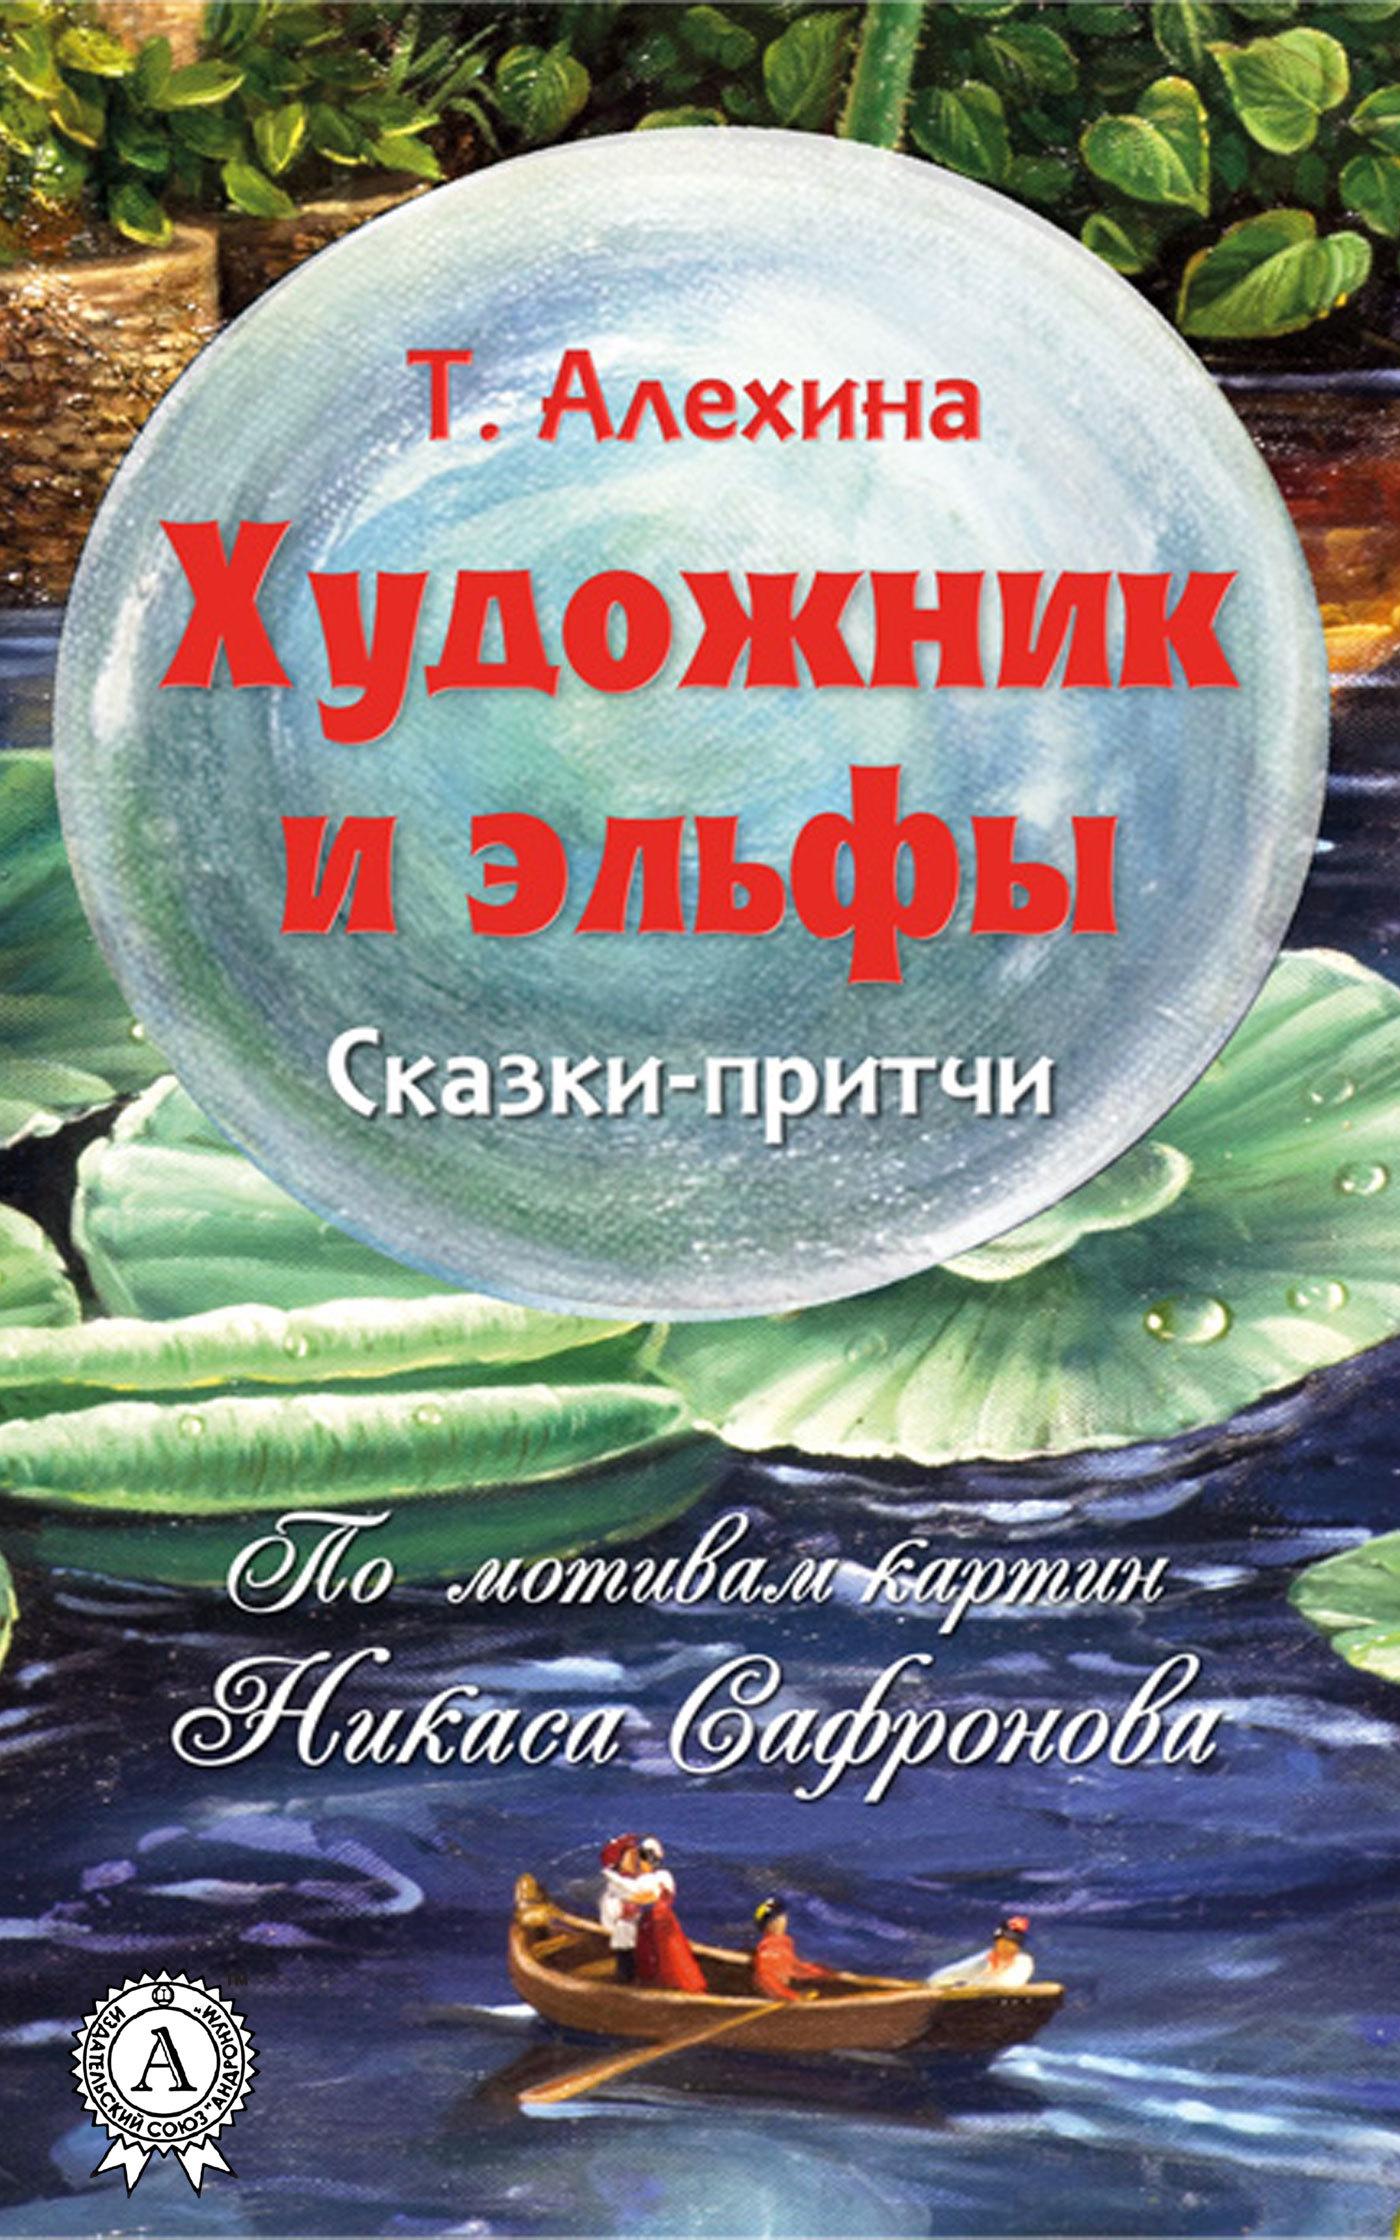 Тамара Алехина Художник и эльфы тамара алехина город золотой